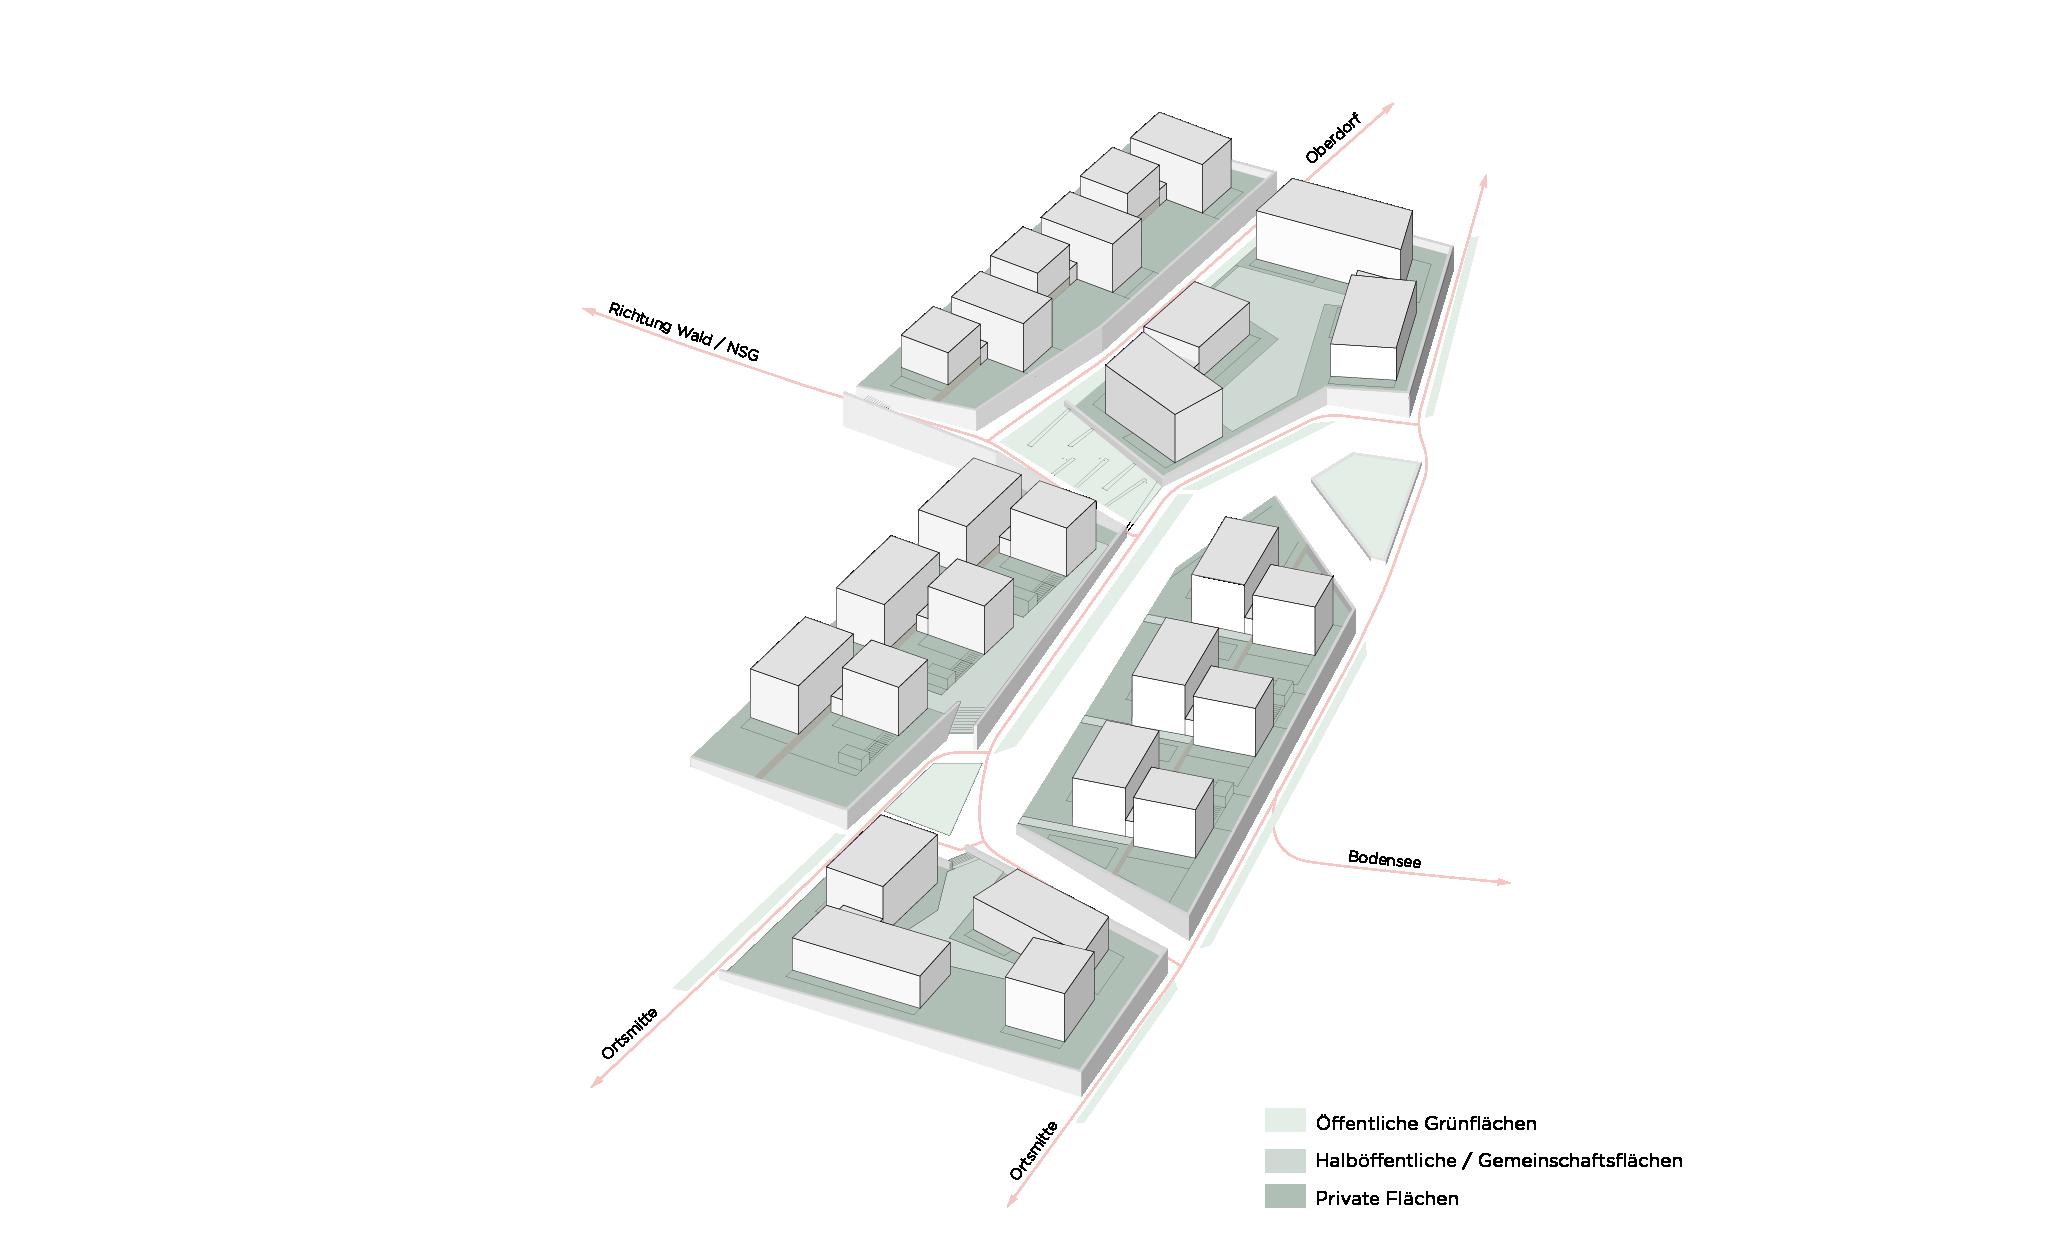 Konstanz Litzelstetten Marienweg Wettbewerb Grünflächen Freiraum Flächennutzung Konzept